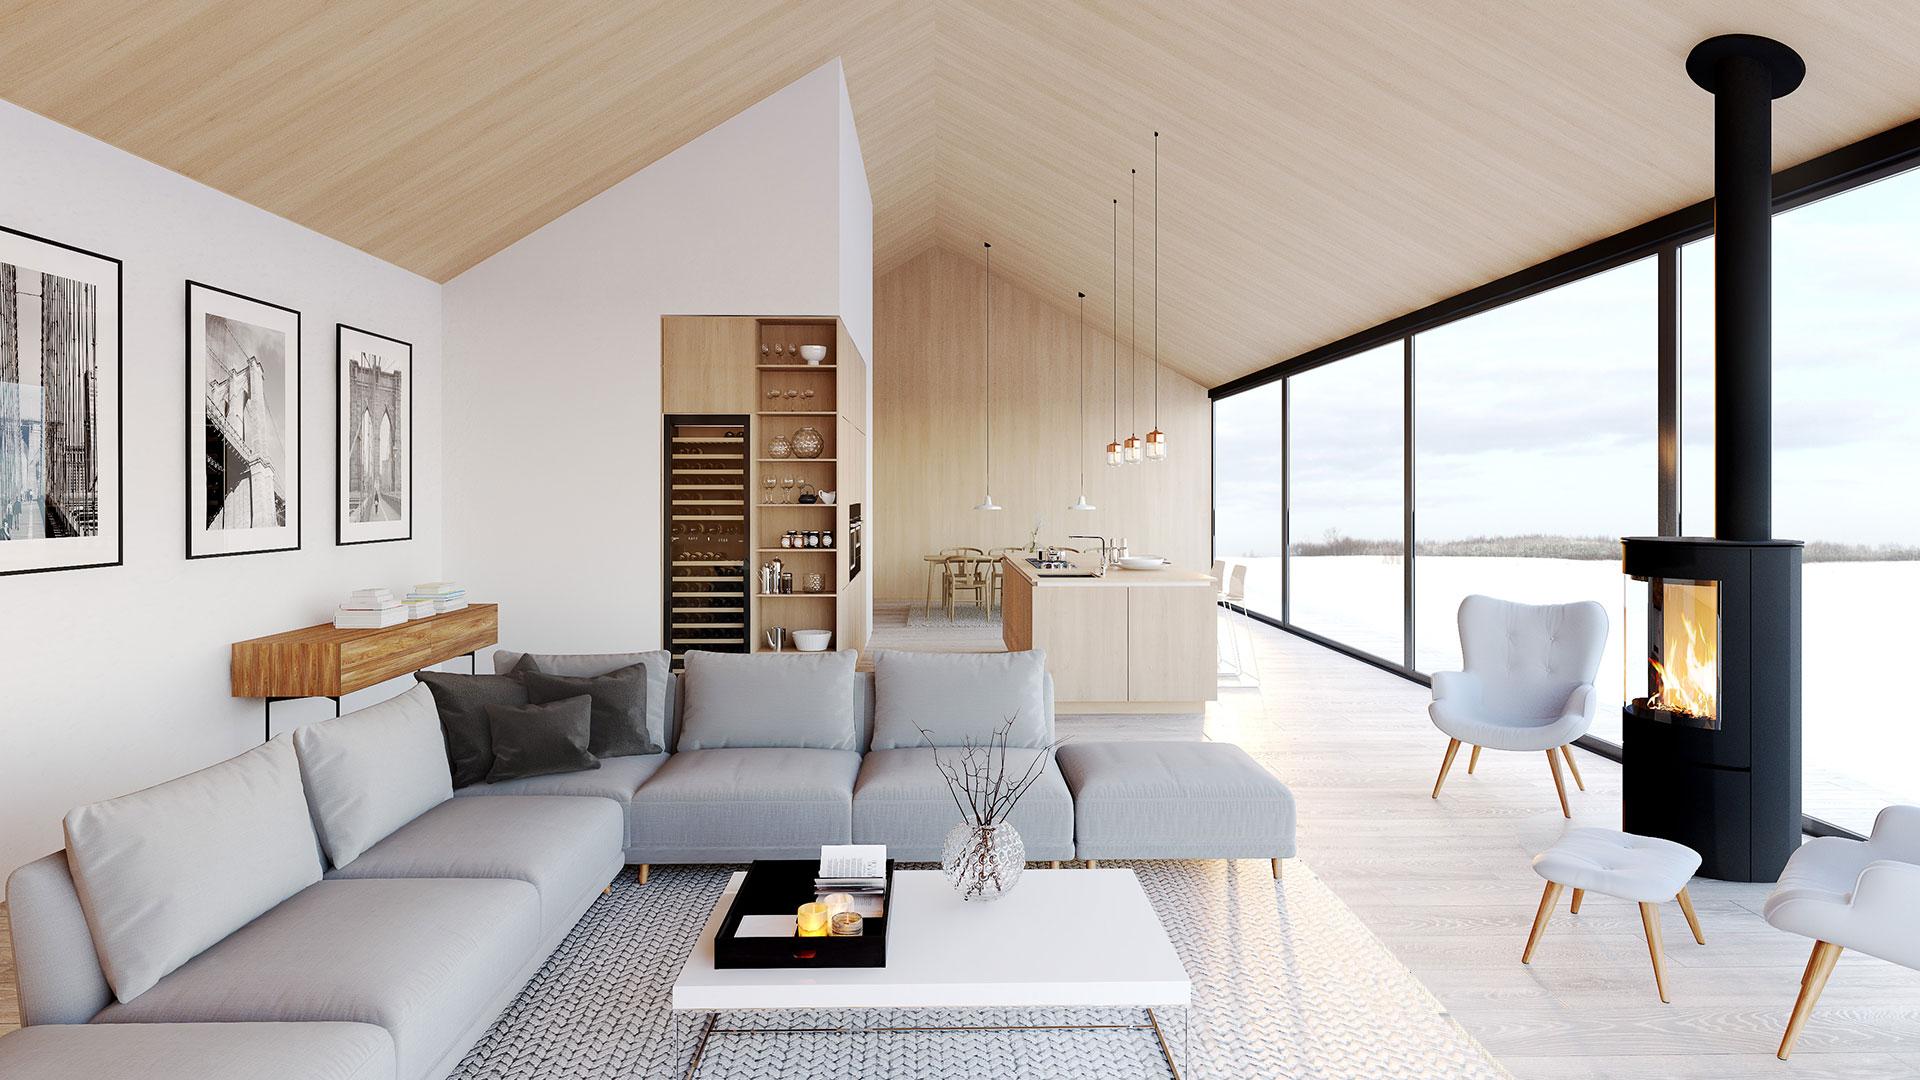 Kolberg-Immobilien-360-Grad-Besichtigung-1